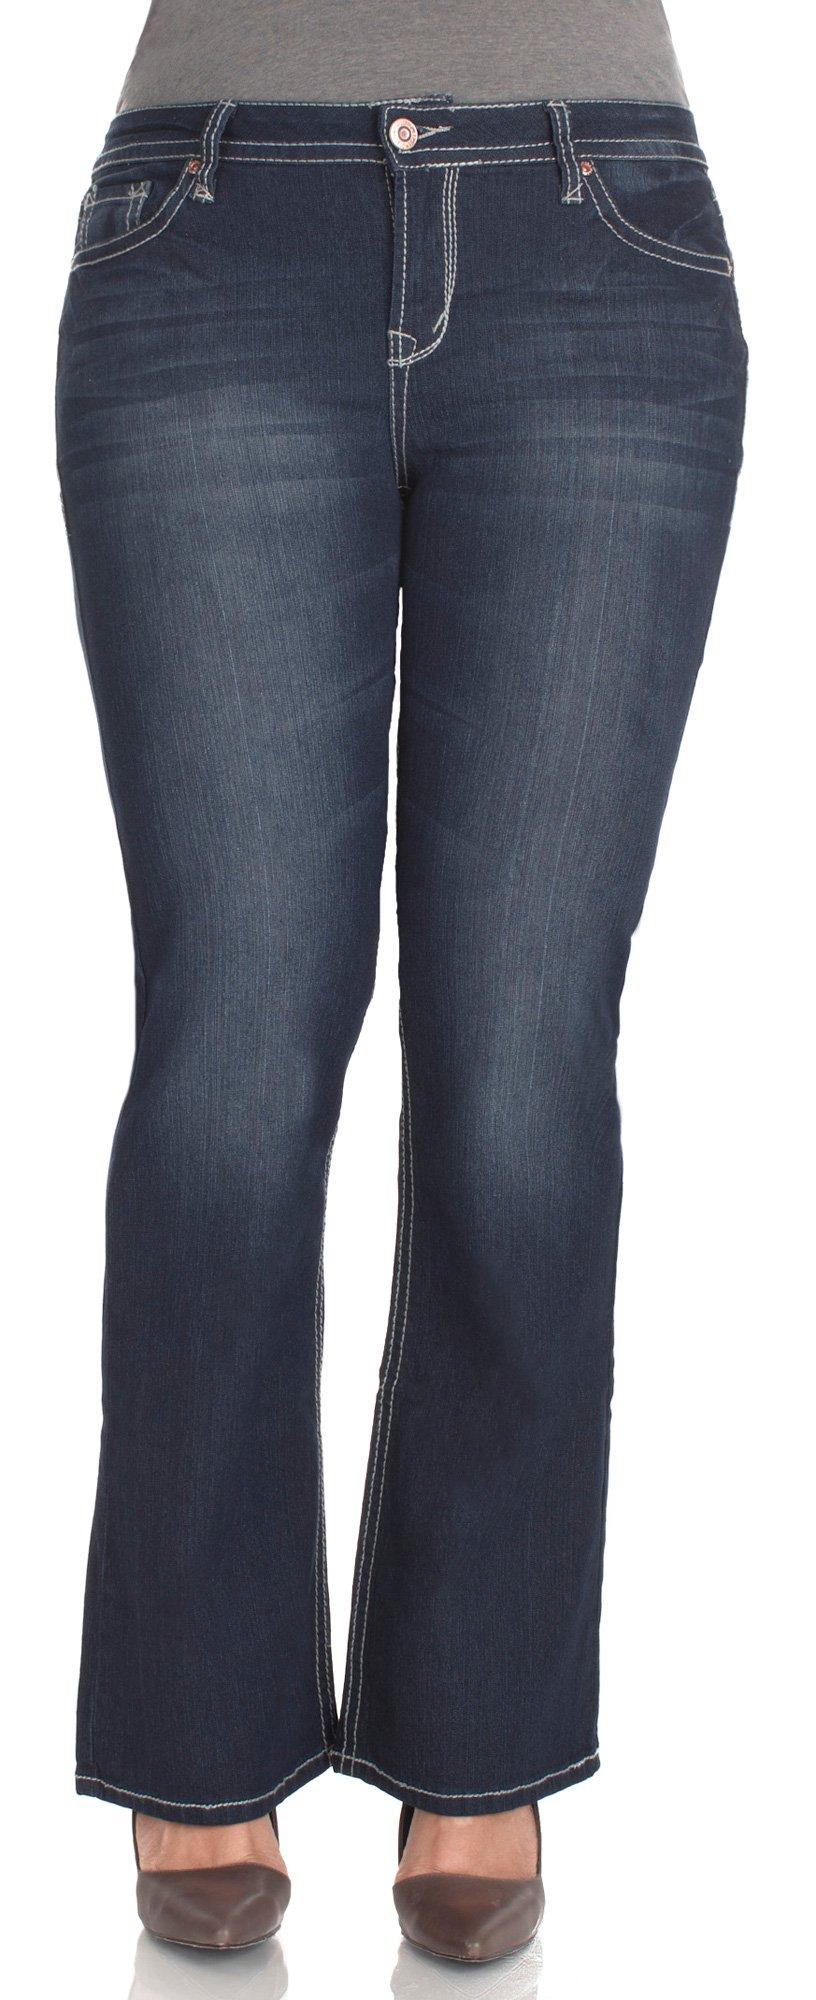 WallFlower Plus Size Plus Short Inseam Basic Legendary Bootcut Jeans in Britney Size: 22 Plus Short